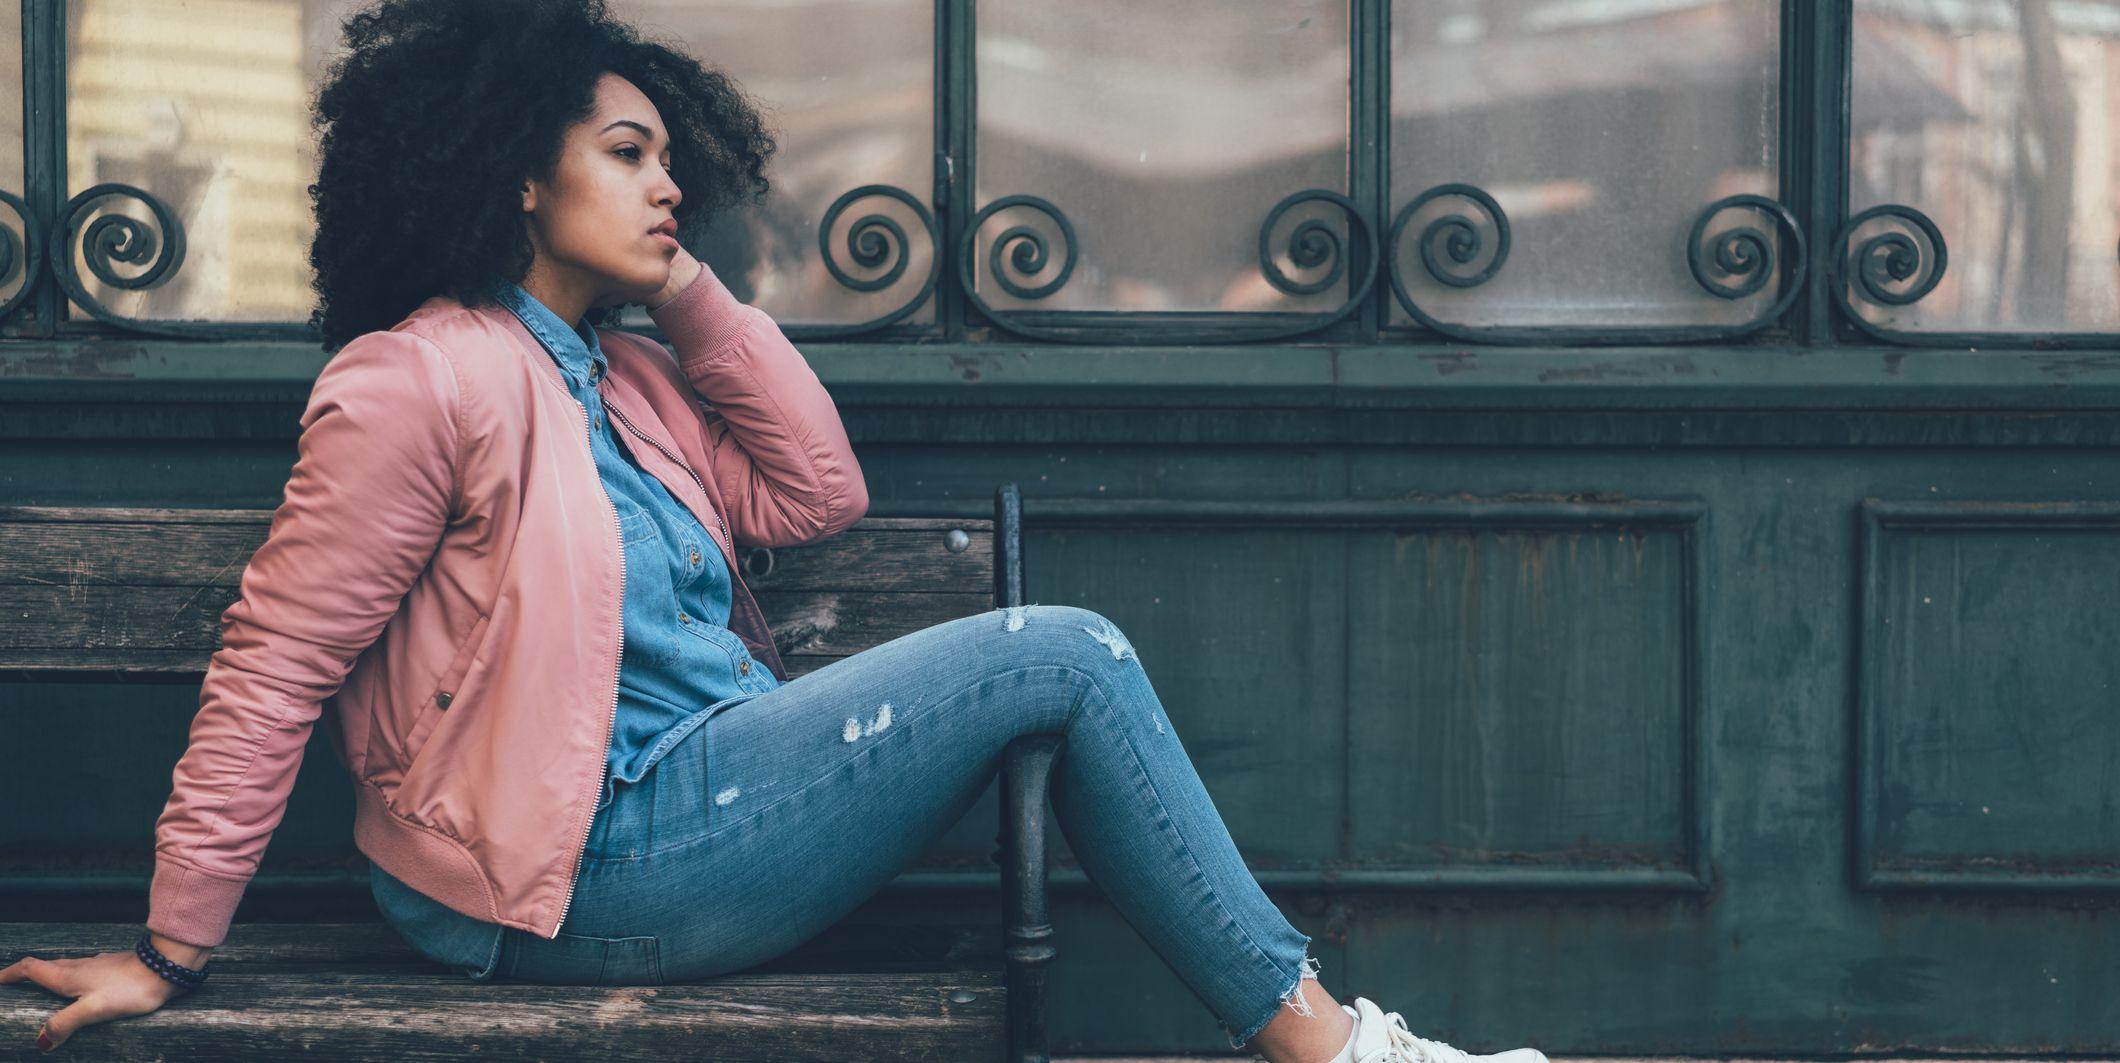 Depressed woman sitting at bench